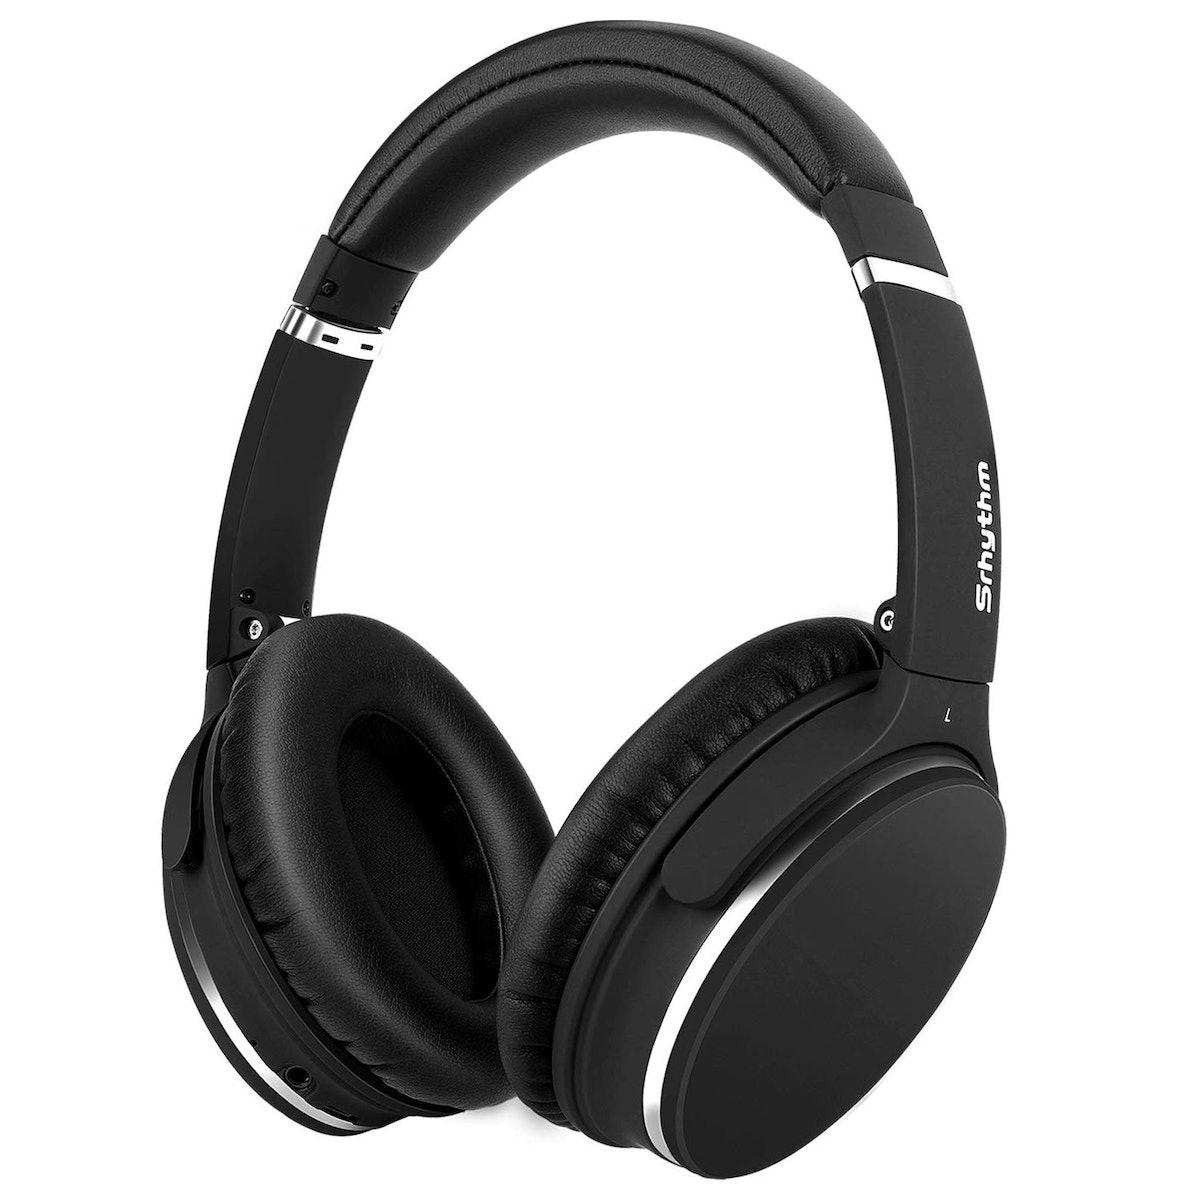 Noise Cancelling Headphones Real Over Ear,Wireless Lightweight Srhythm Durable Foldable Deep Bass Hi...